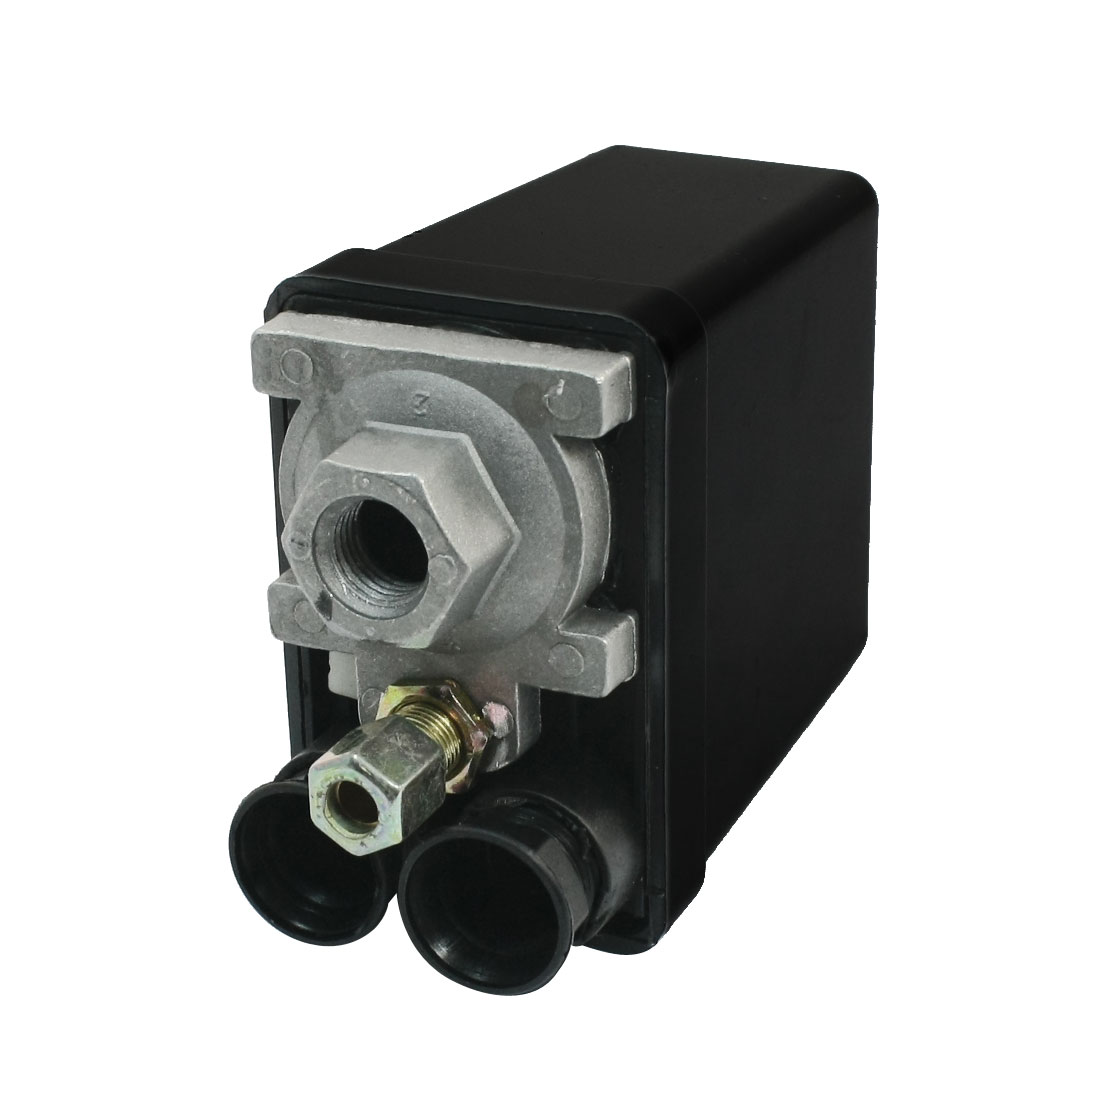 Air compressor pressure switch control valve ac240v 20a 175psi 12bar 1